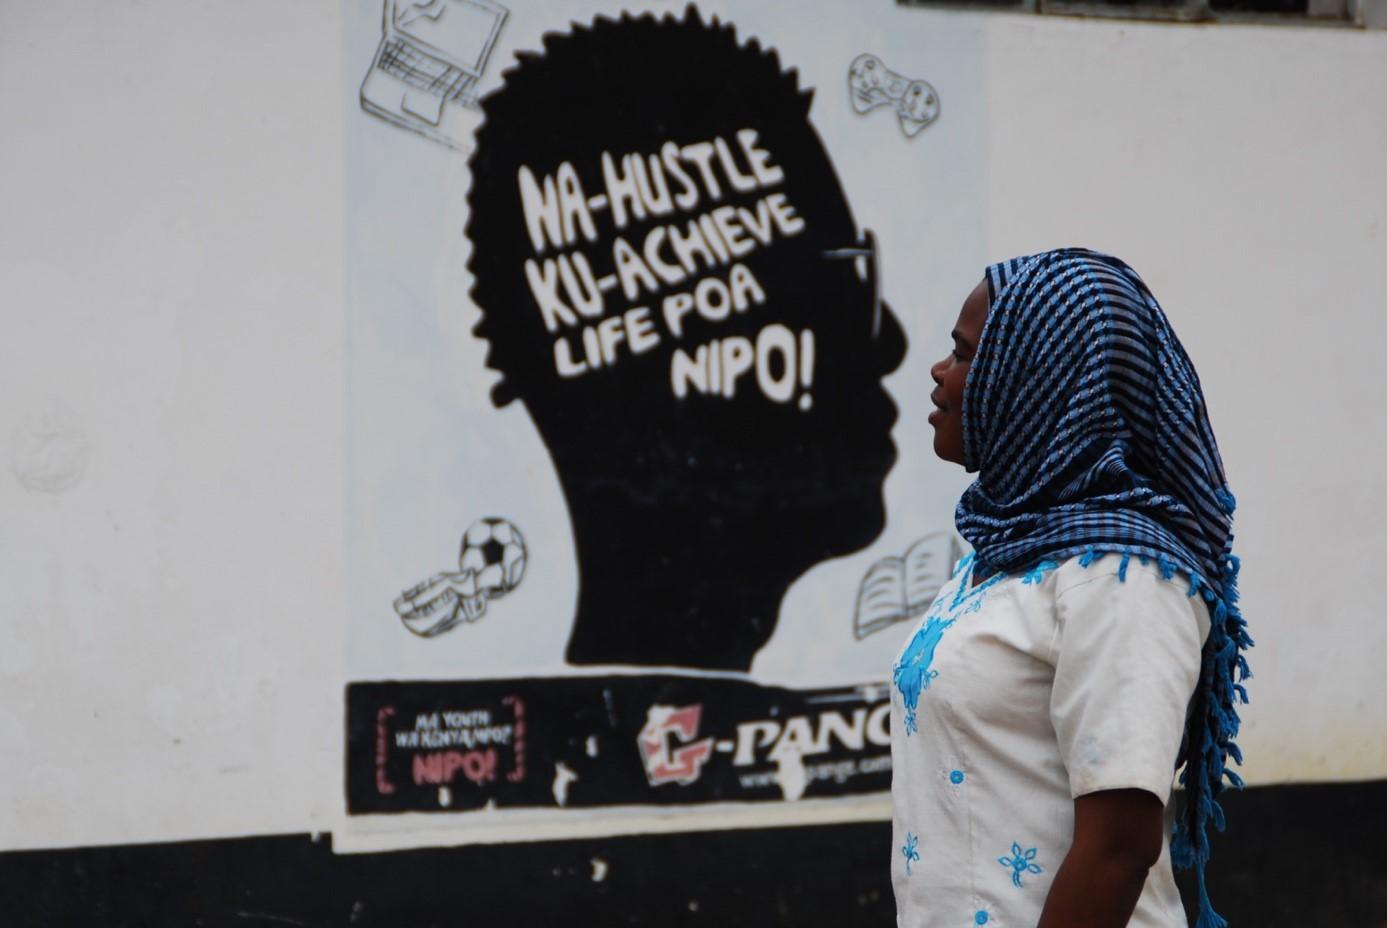 Na-Hustle Ku-Achieve Life Poa Nipo!